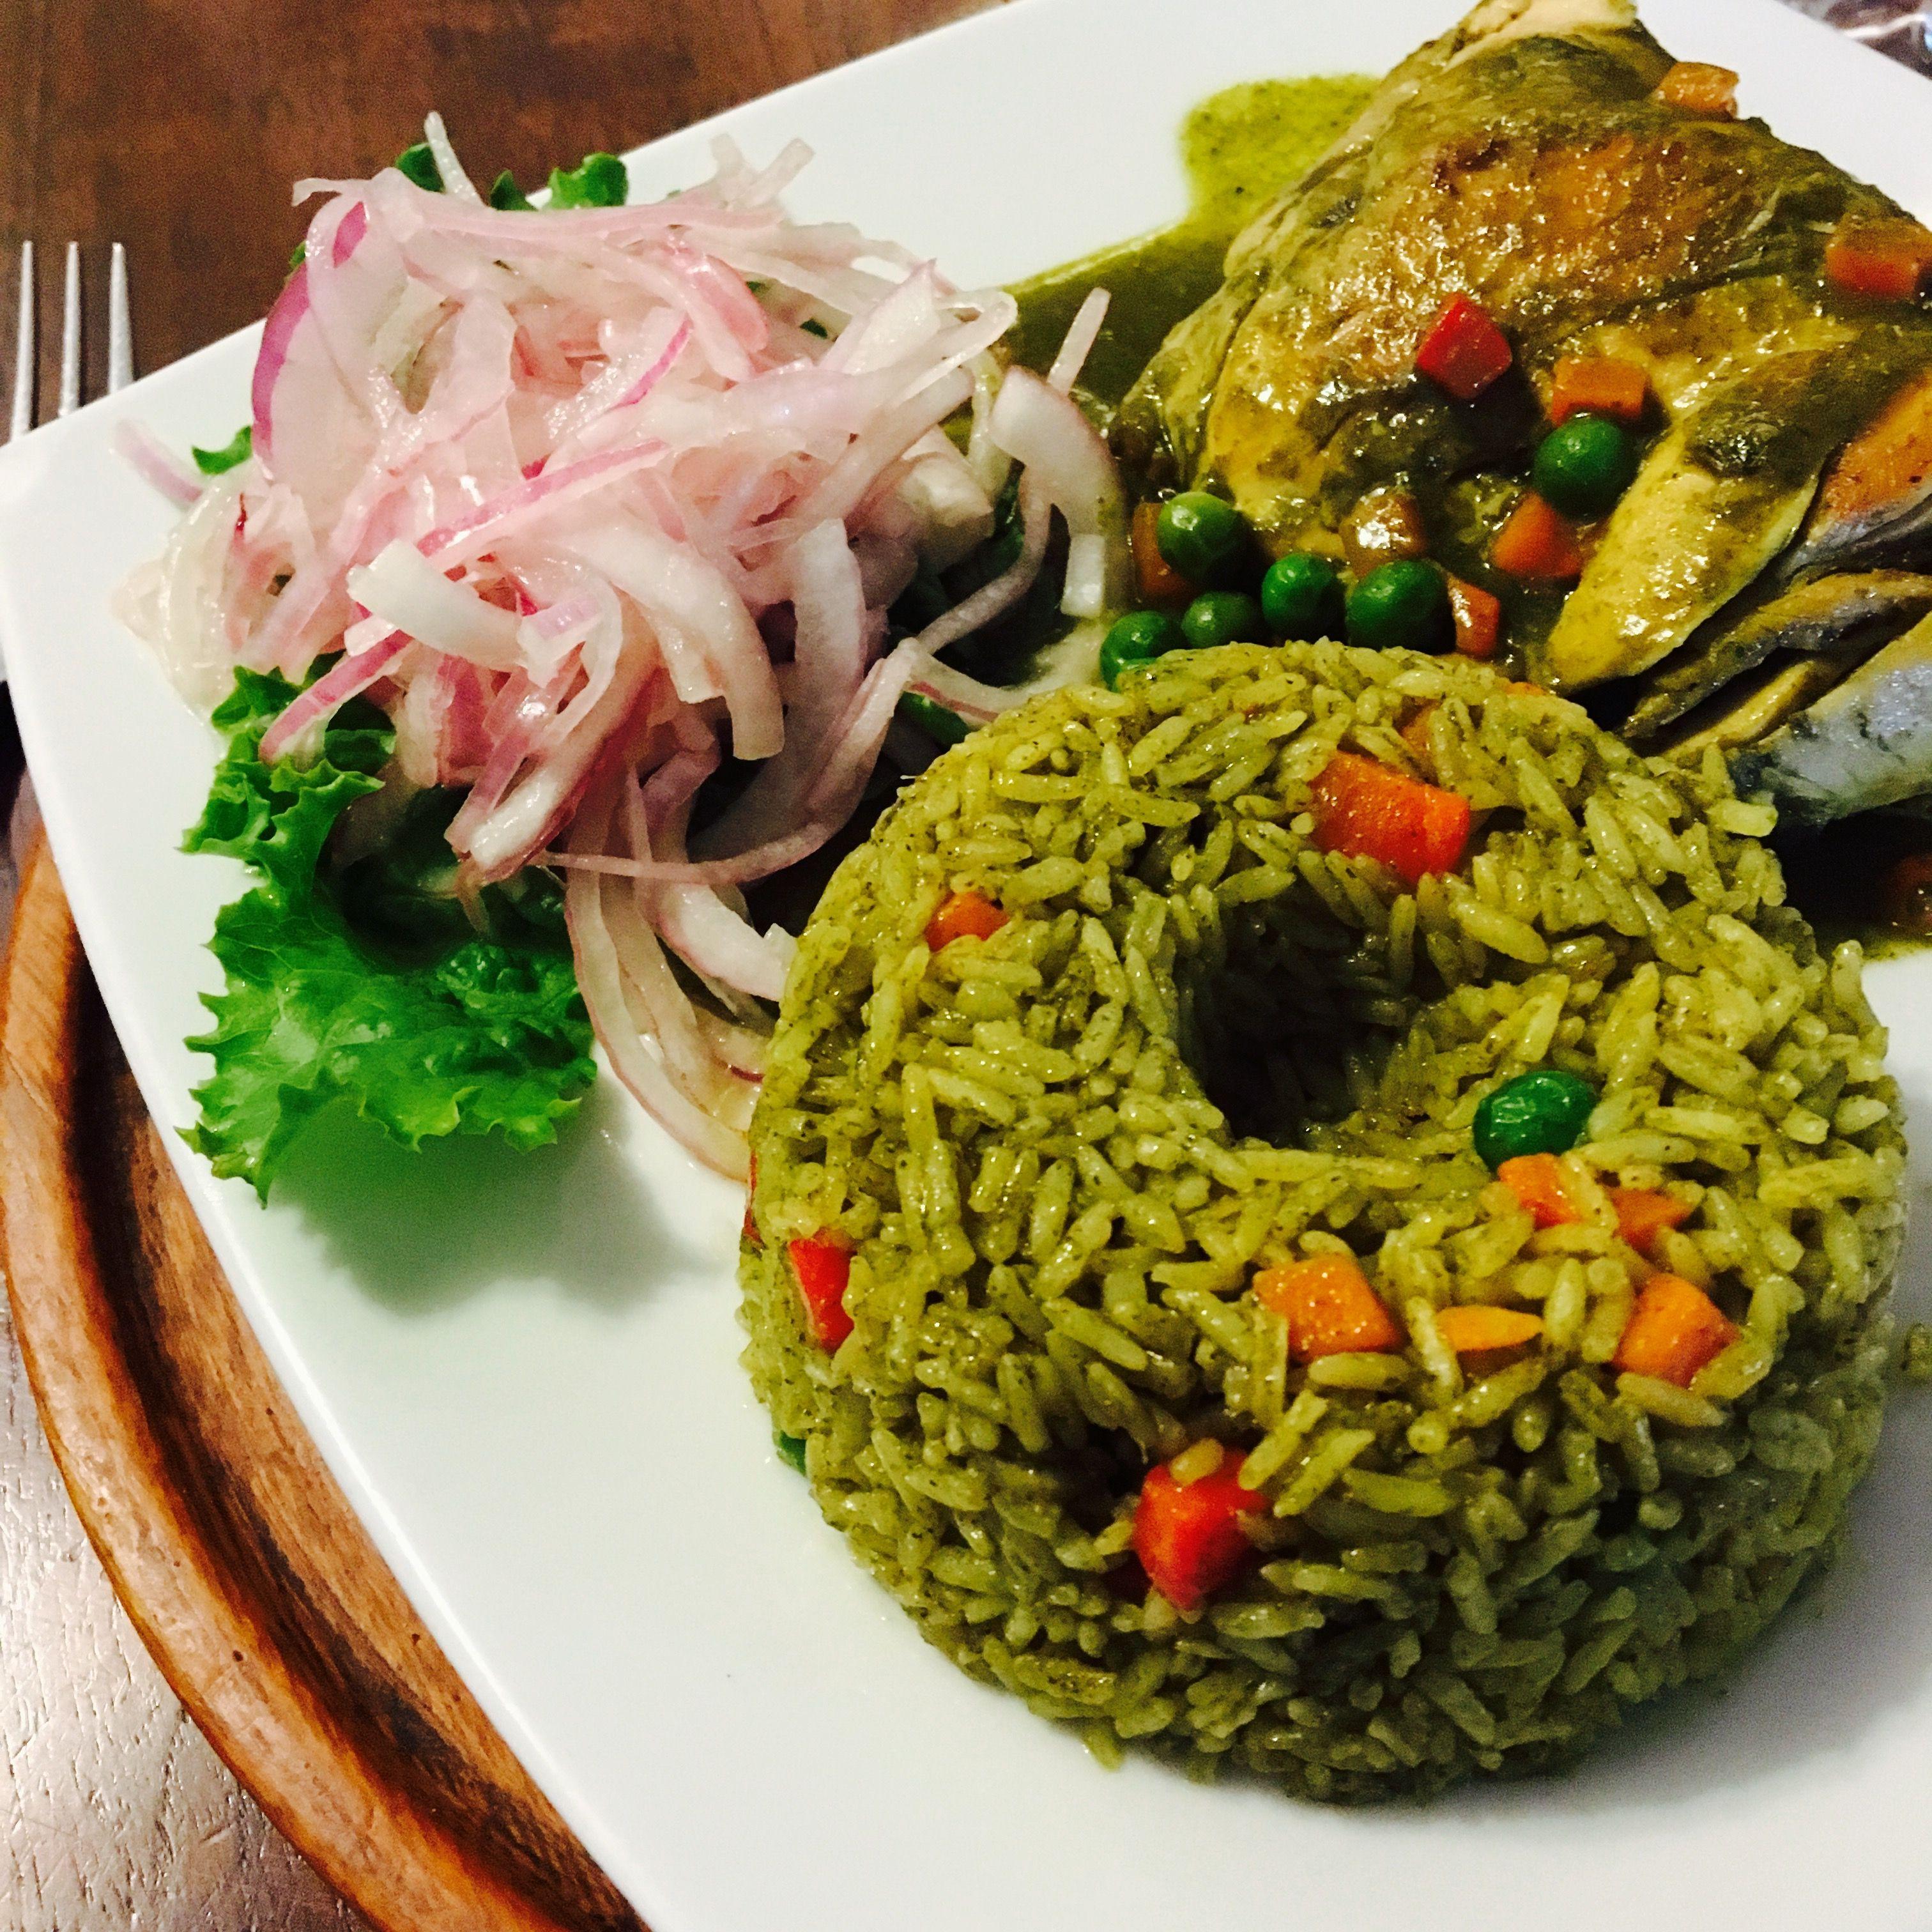 La Maravillosa Comida Peruana